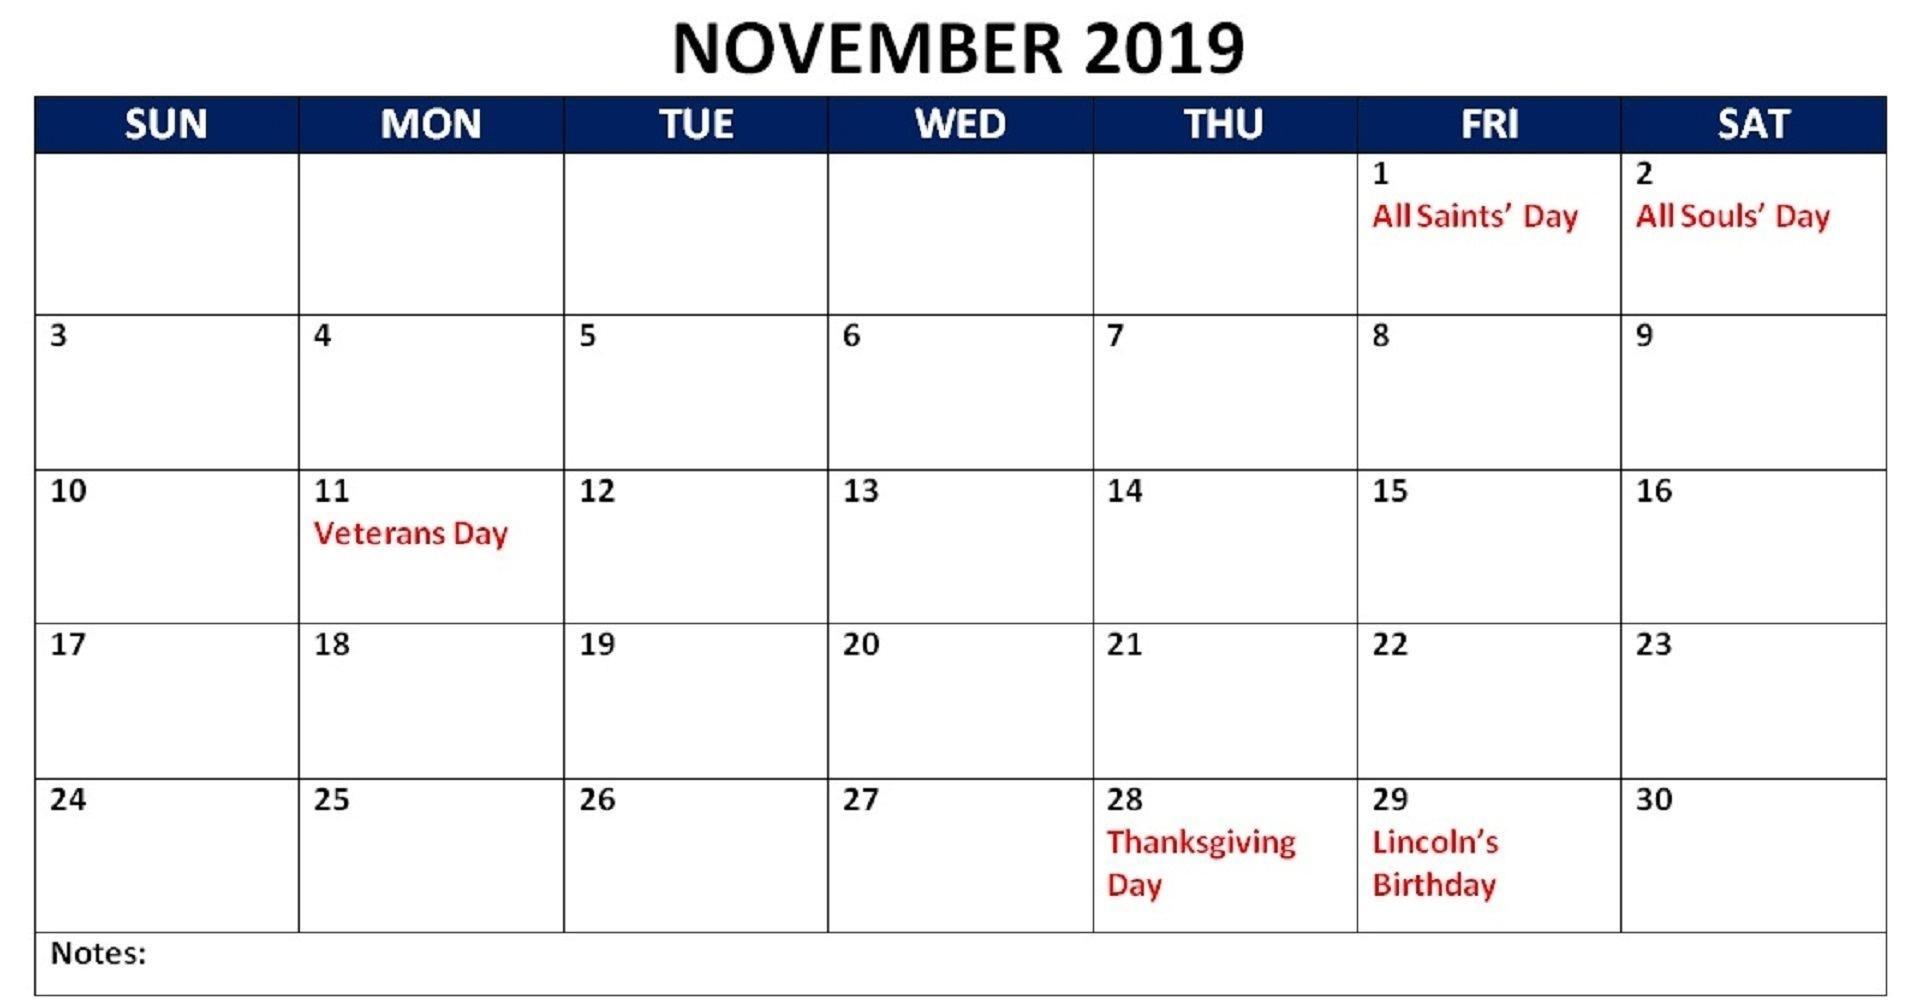 November 2019 Calendar with Holidays India